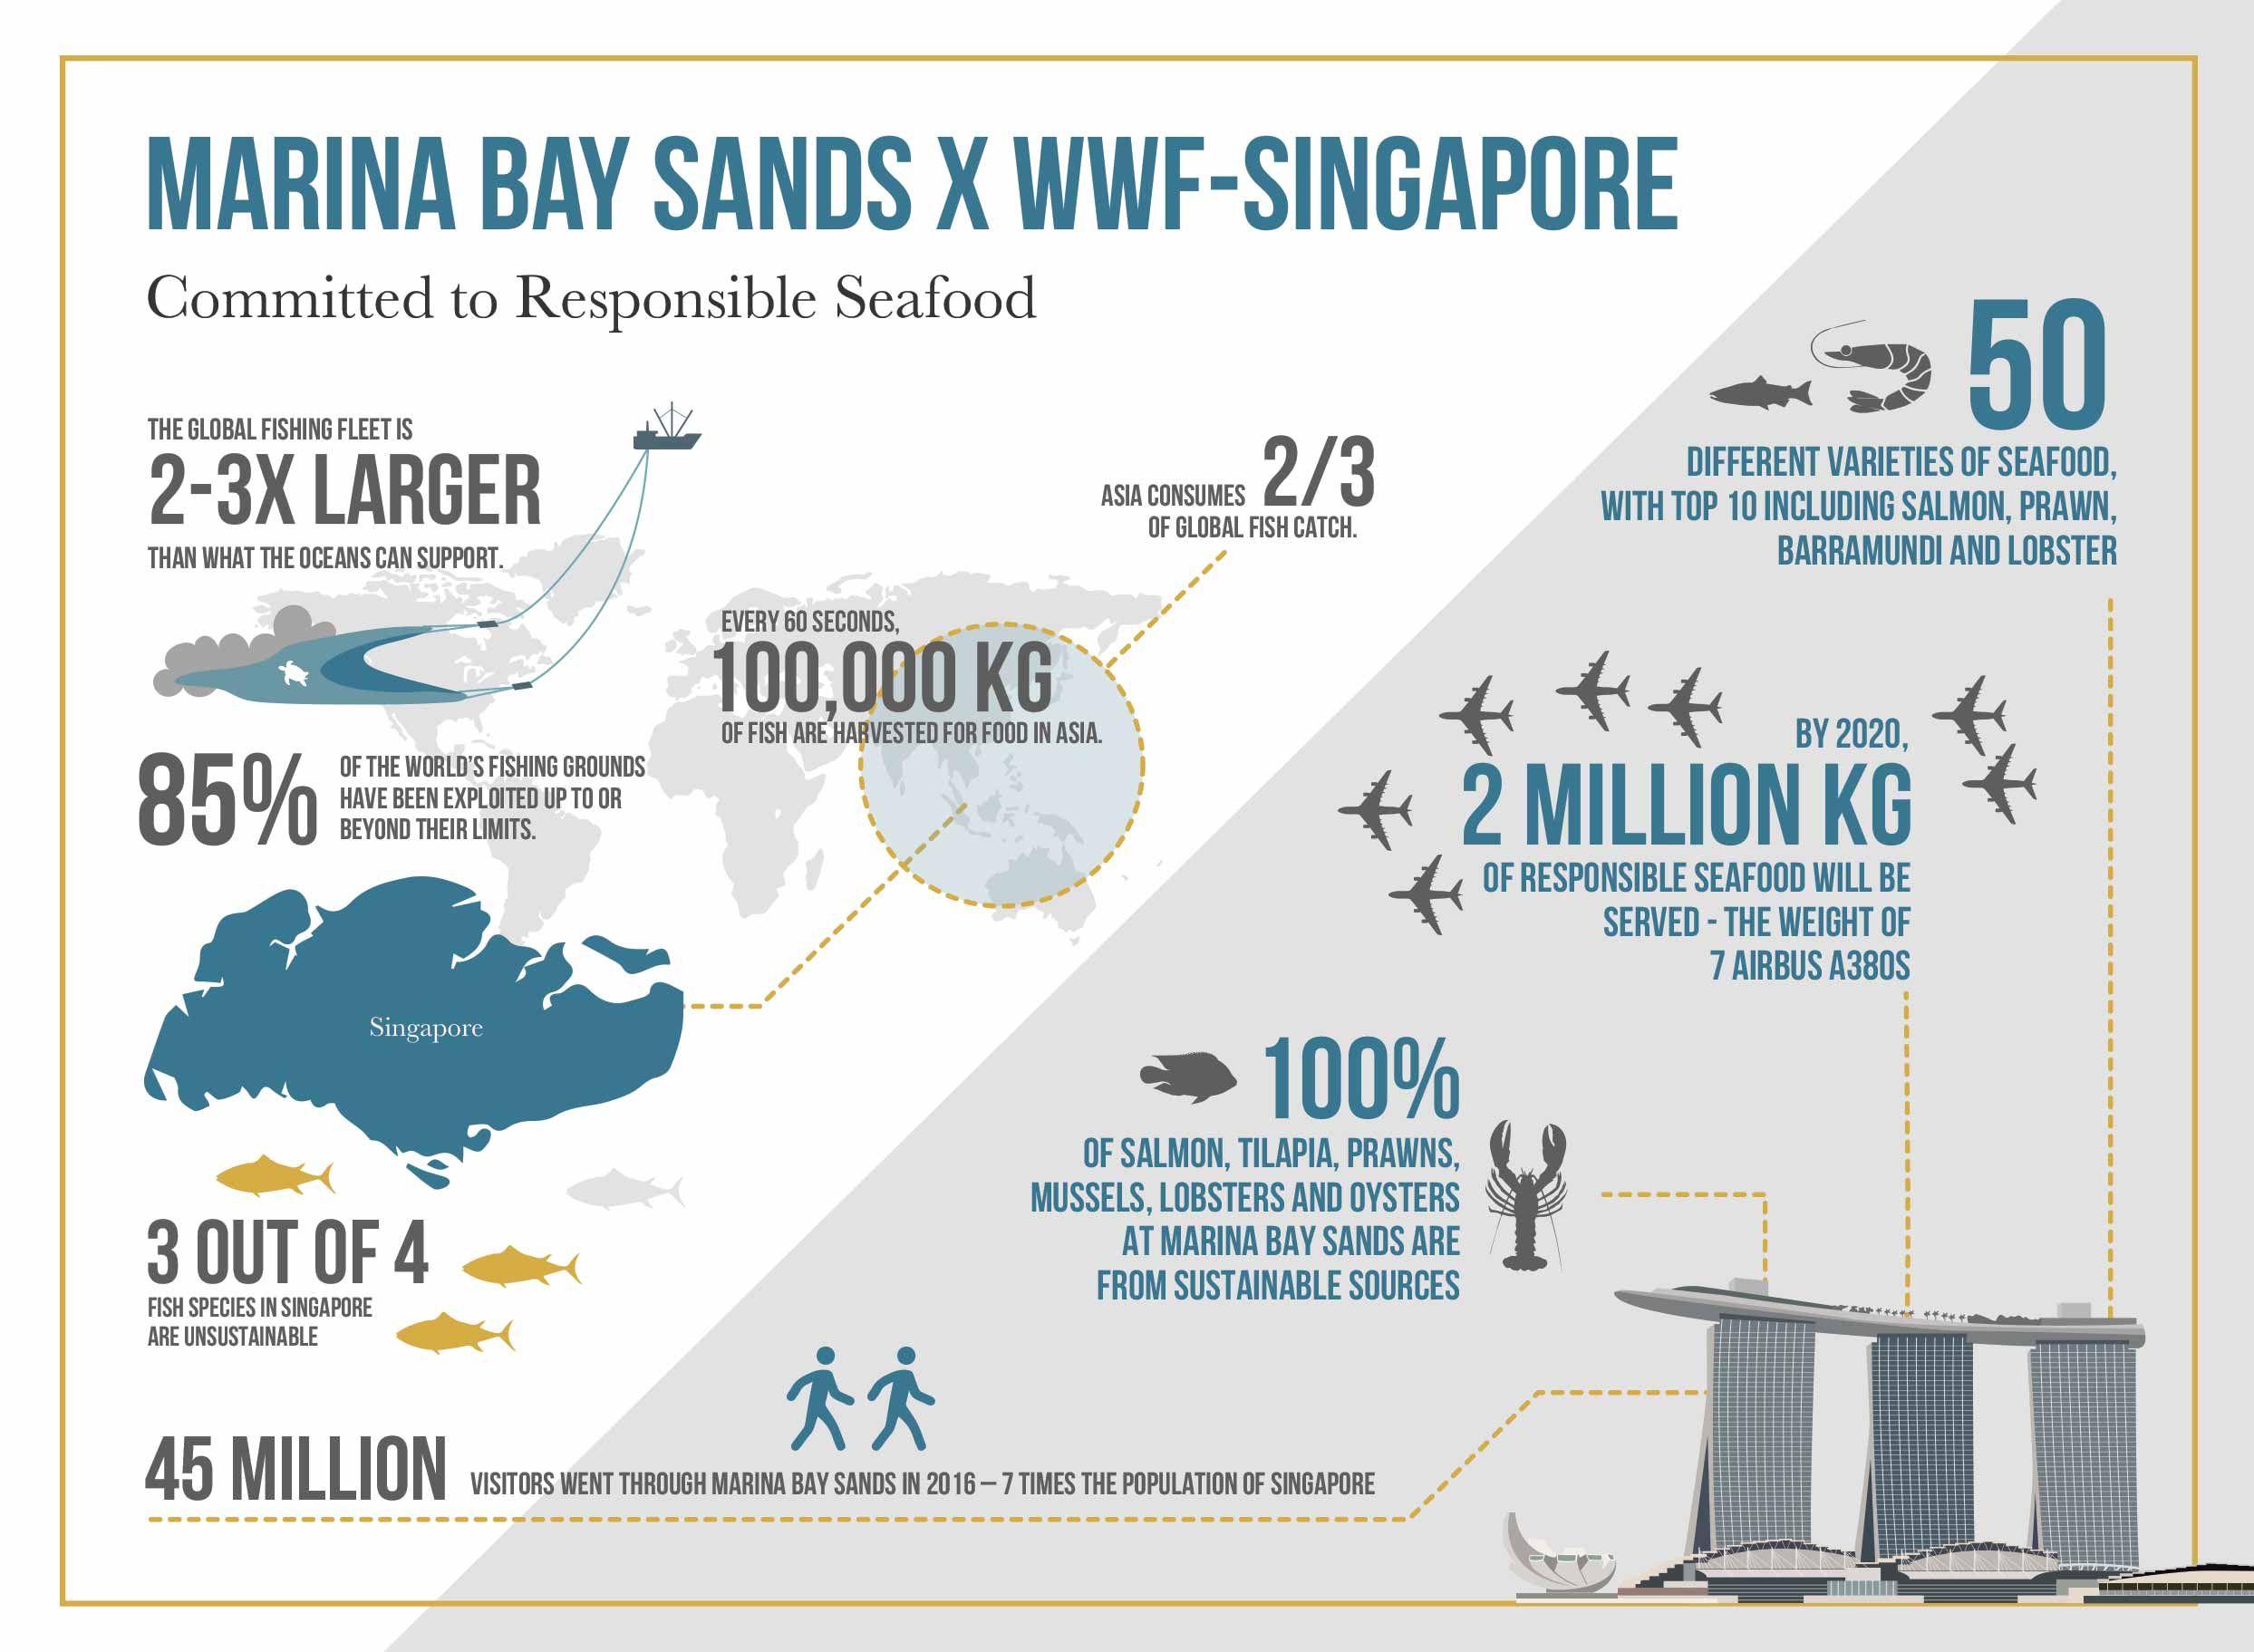 Marina Bay Sands And Wwf To Embark On Sustainability Partnership